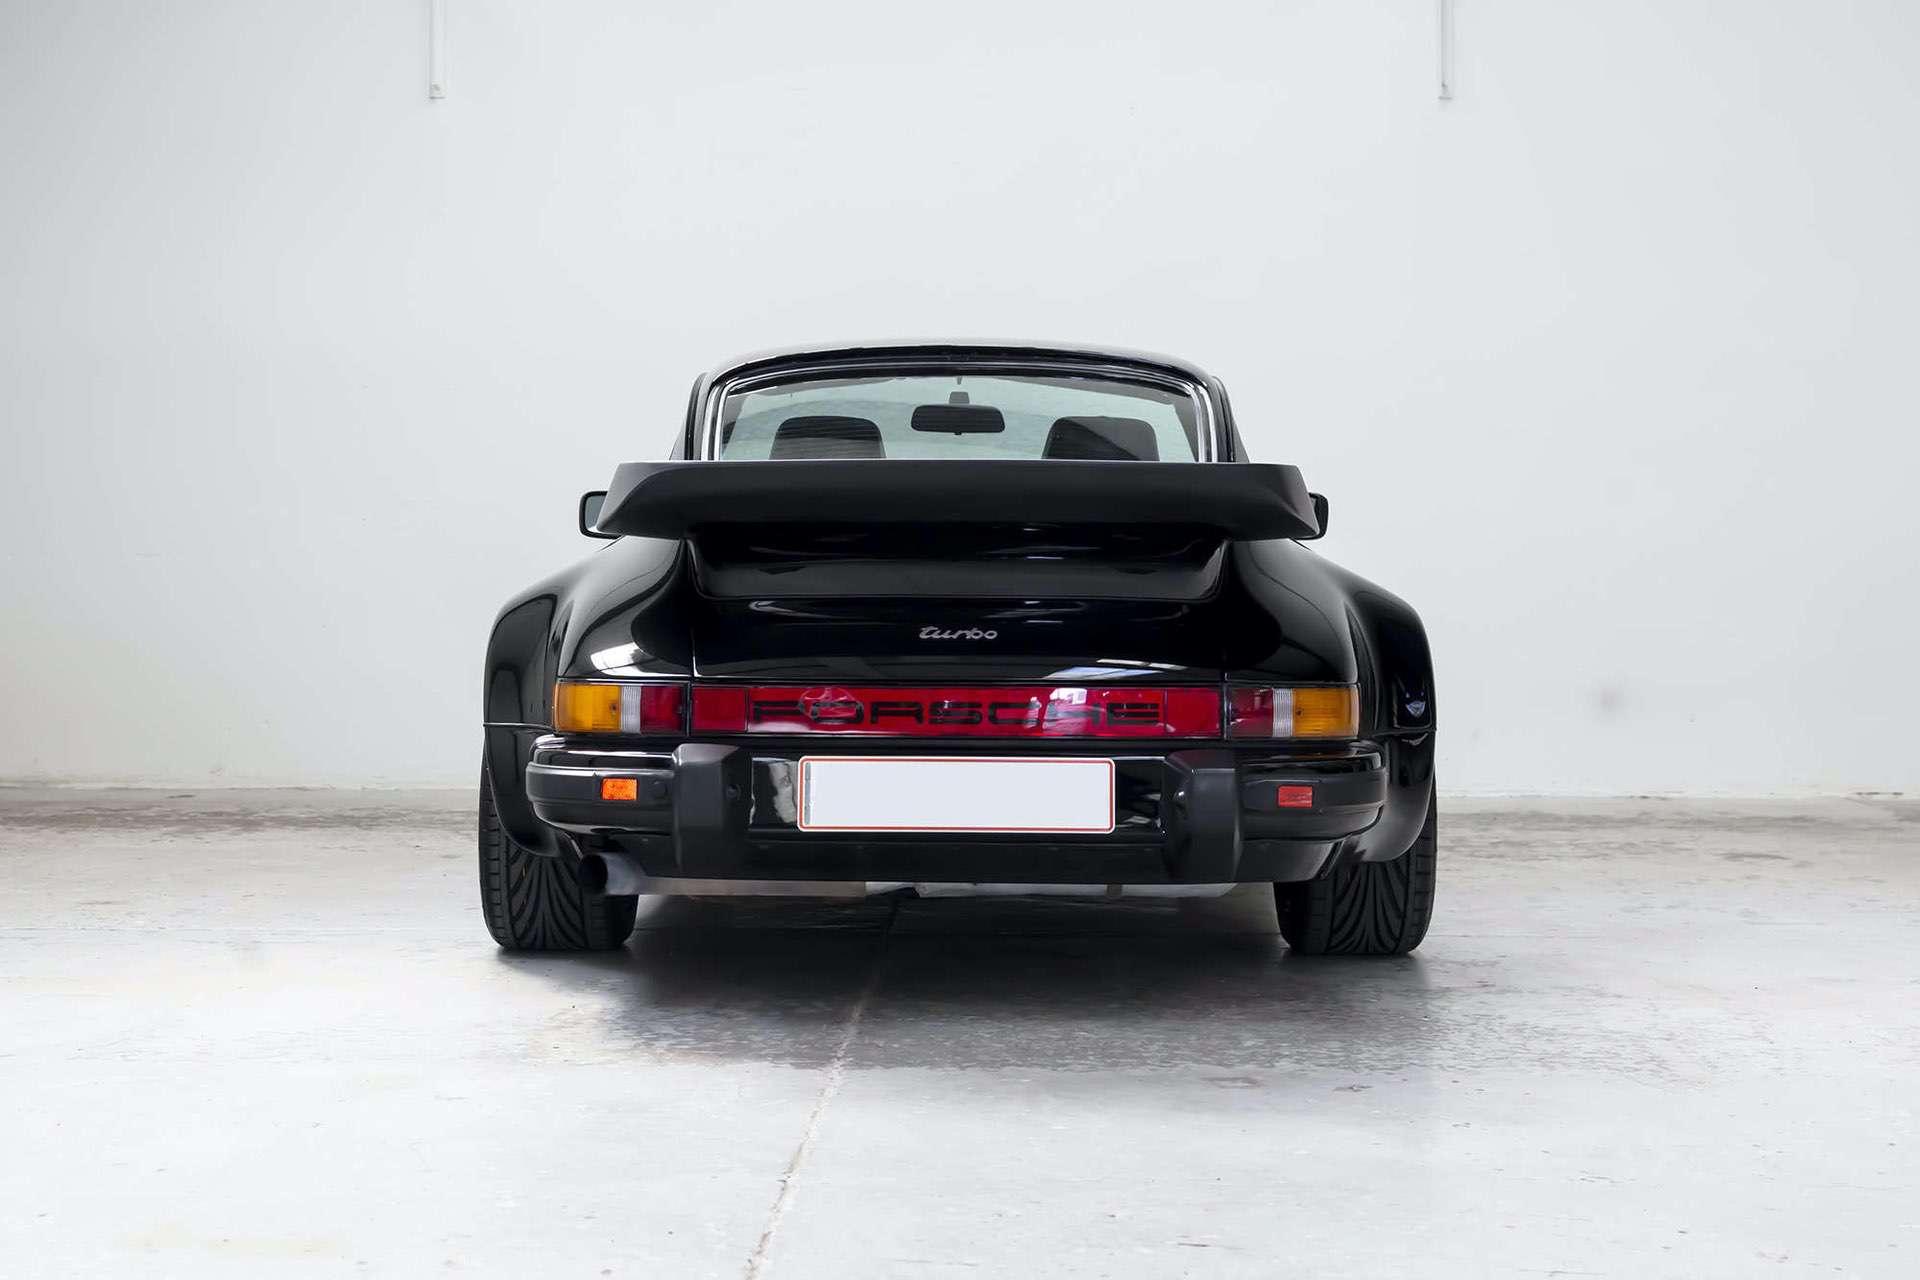 Porsche_911_930_Turbo_0003